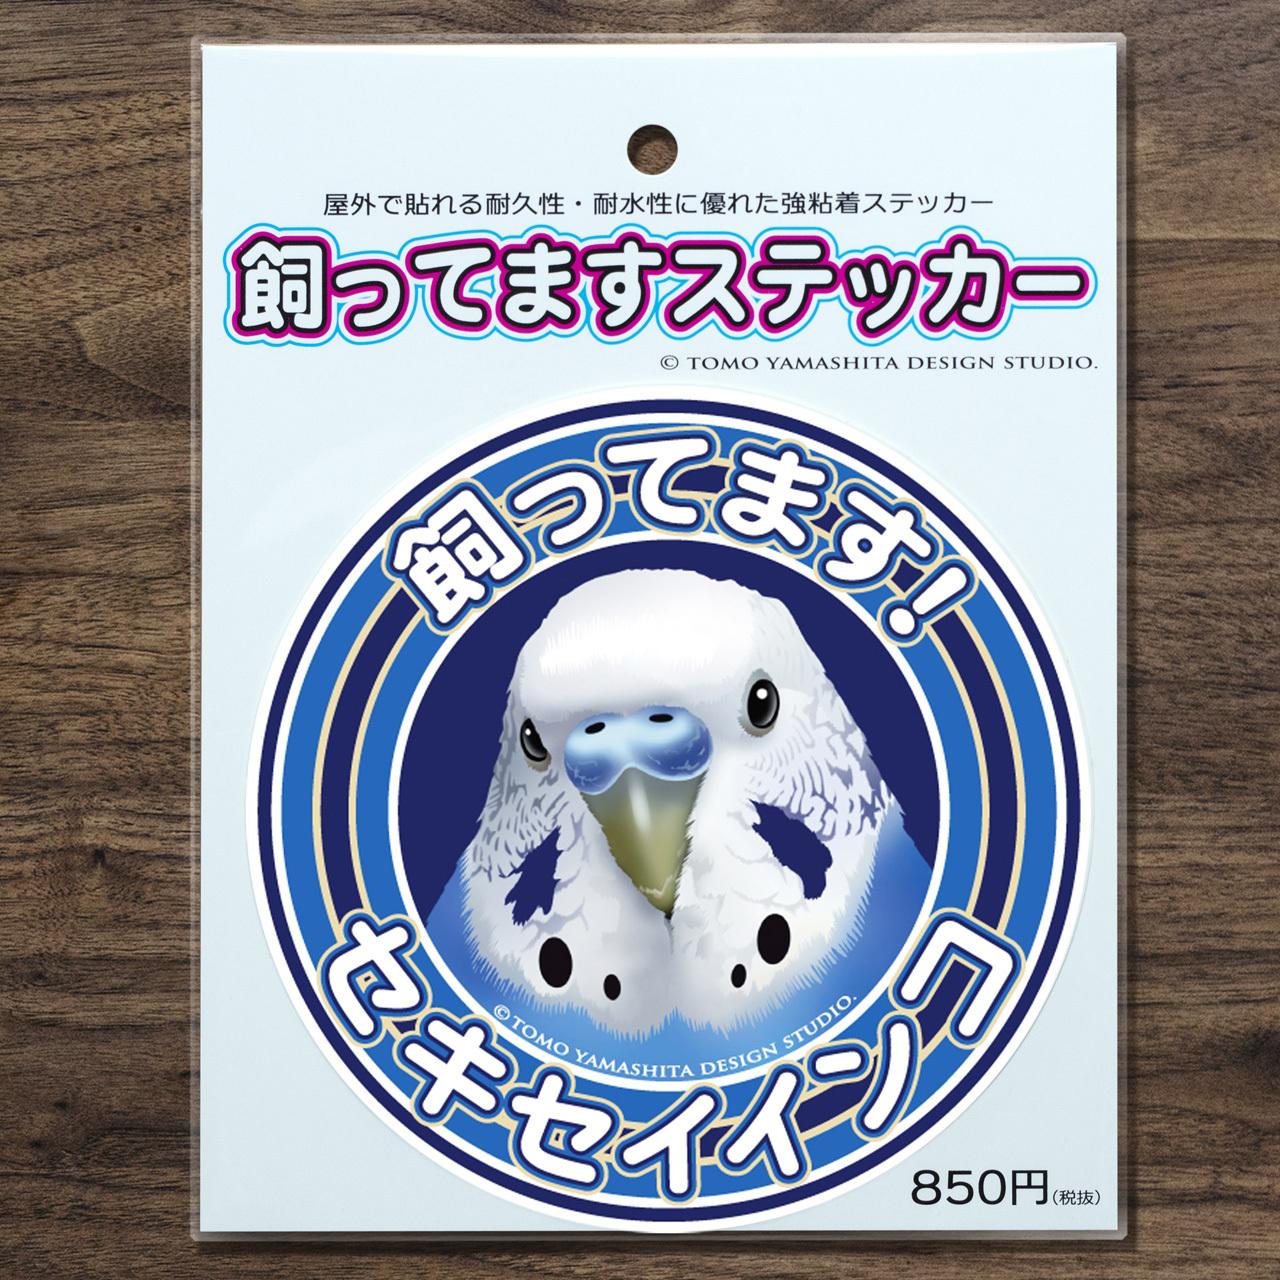 9997880【TOMO YAMASHITA DESIGN STUDIO】飼ってますステッカー セキセイインコ◆